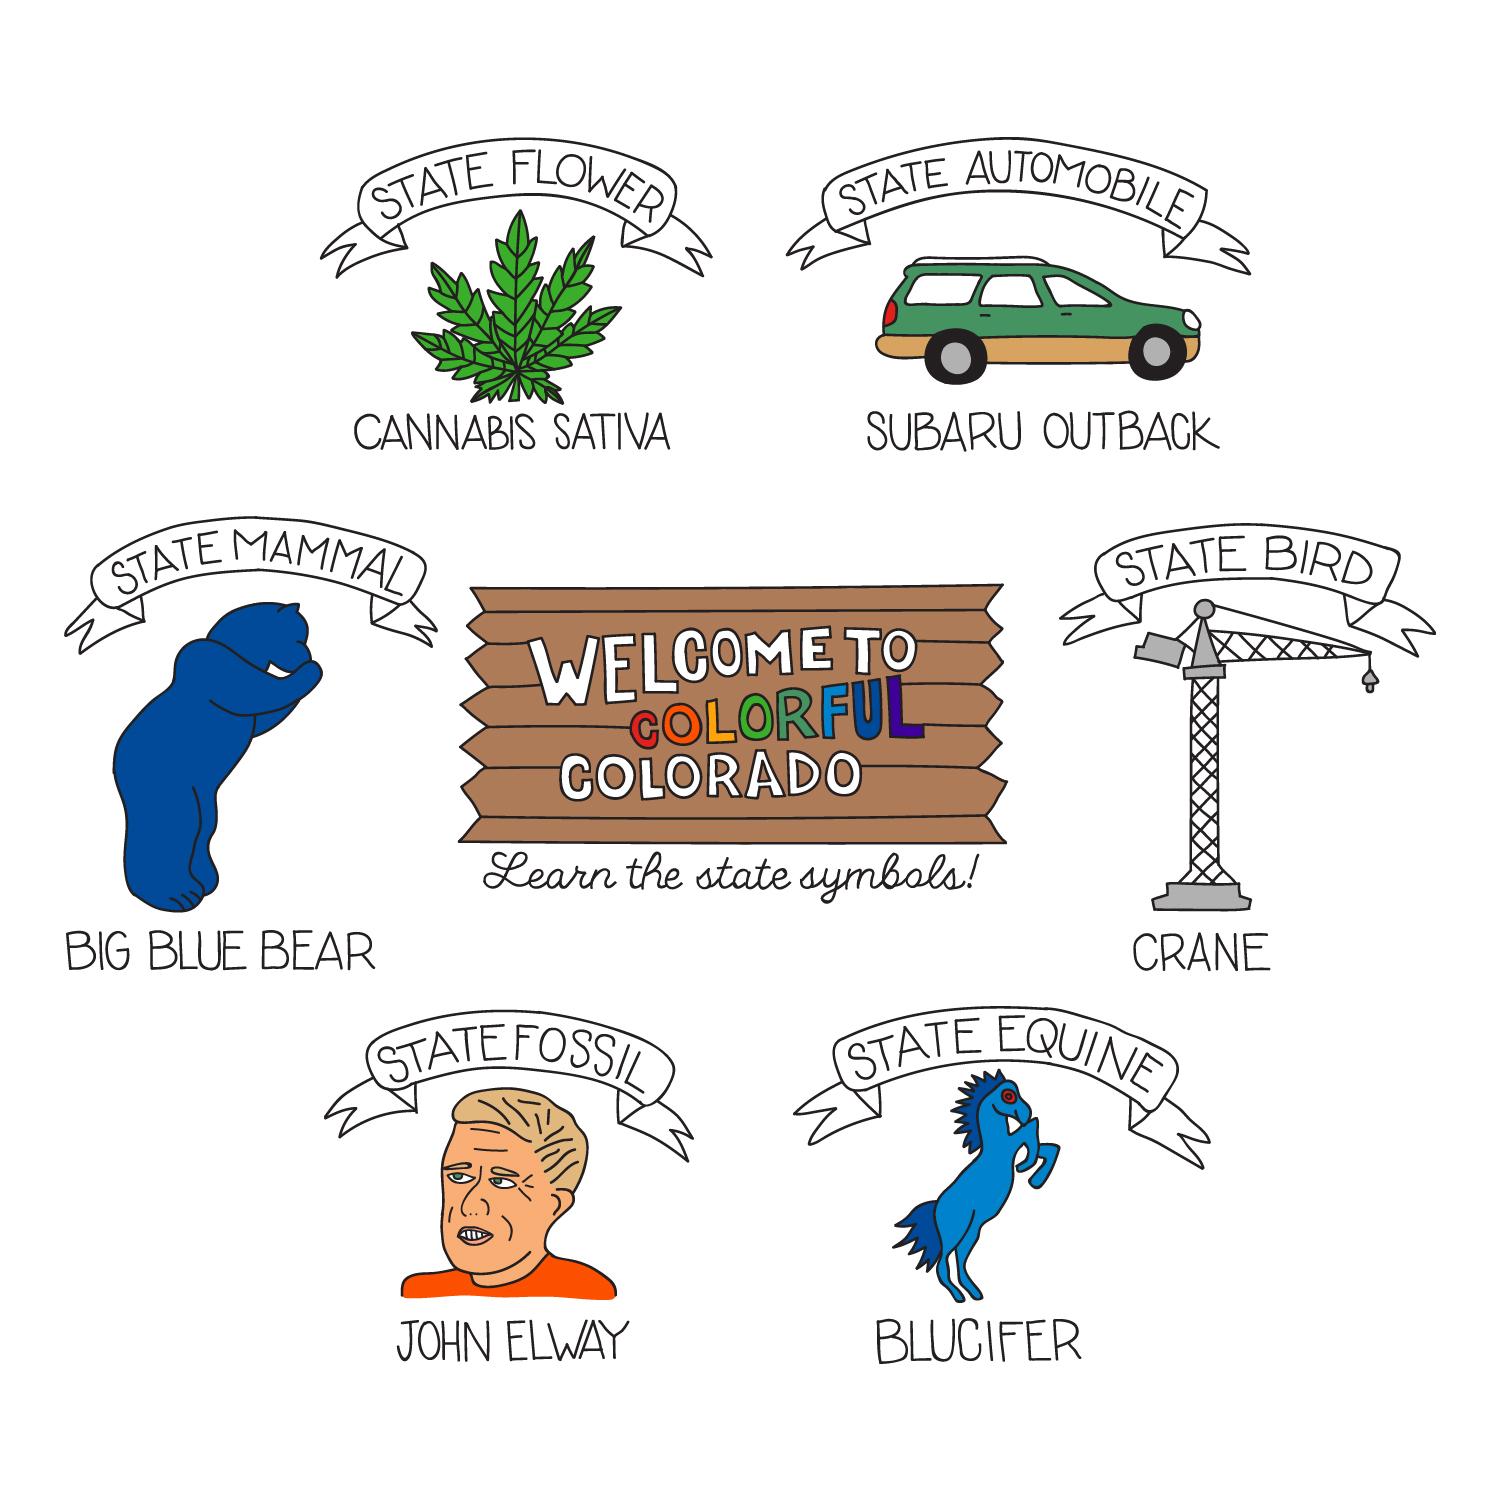 IllustrationImages_State Symbols.jpg